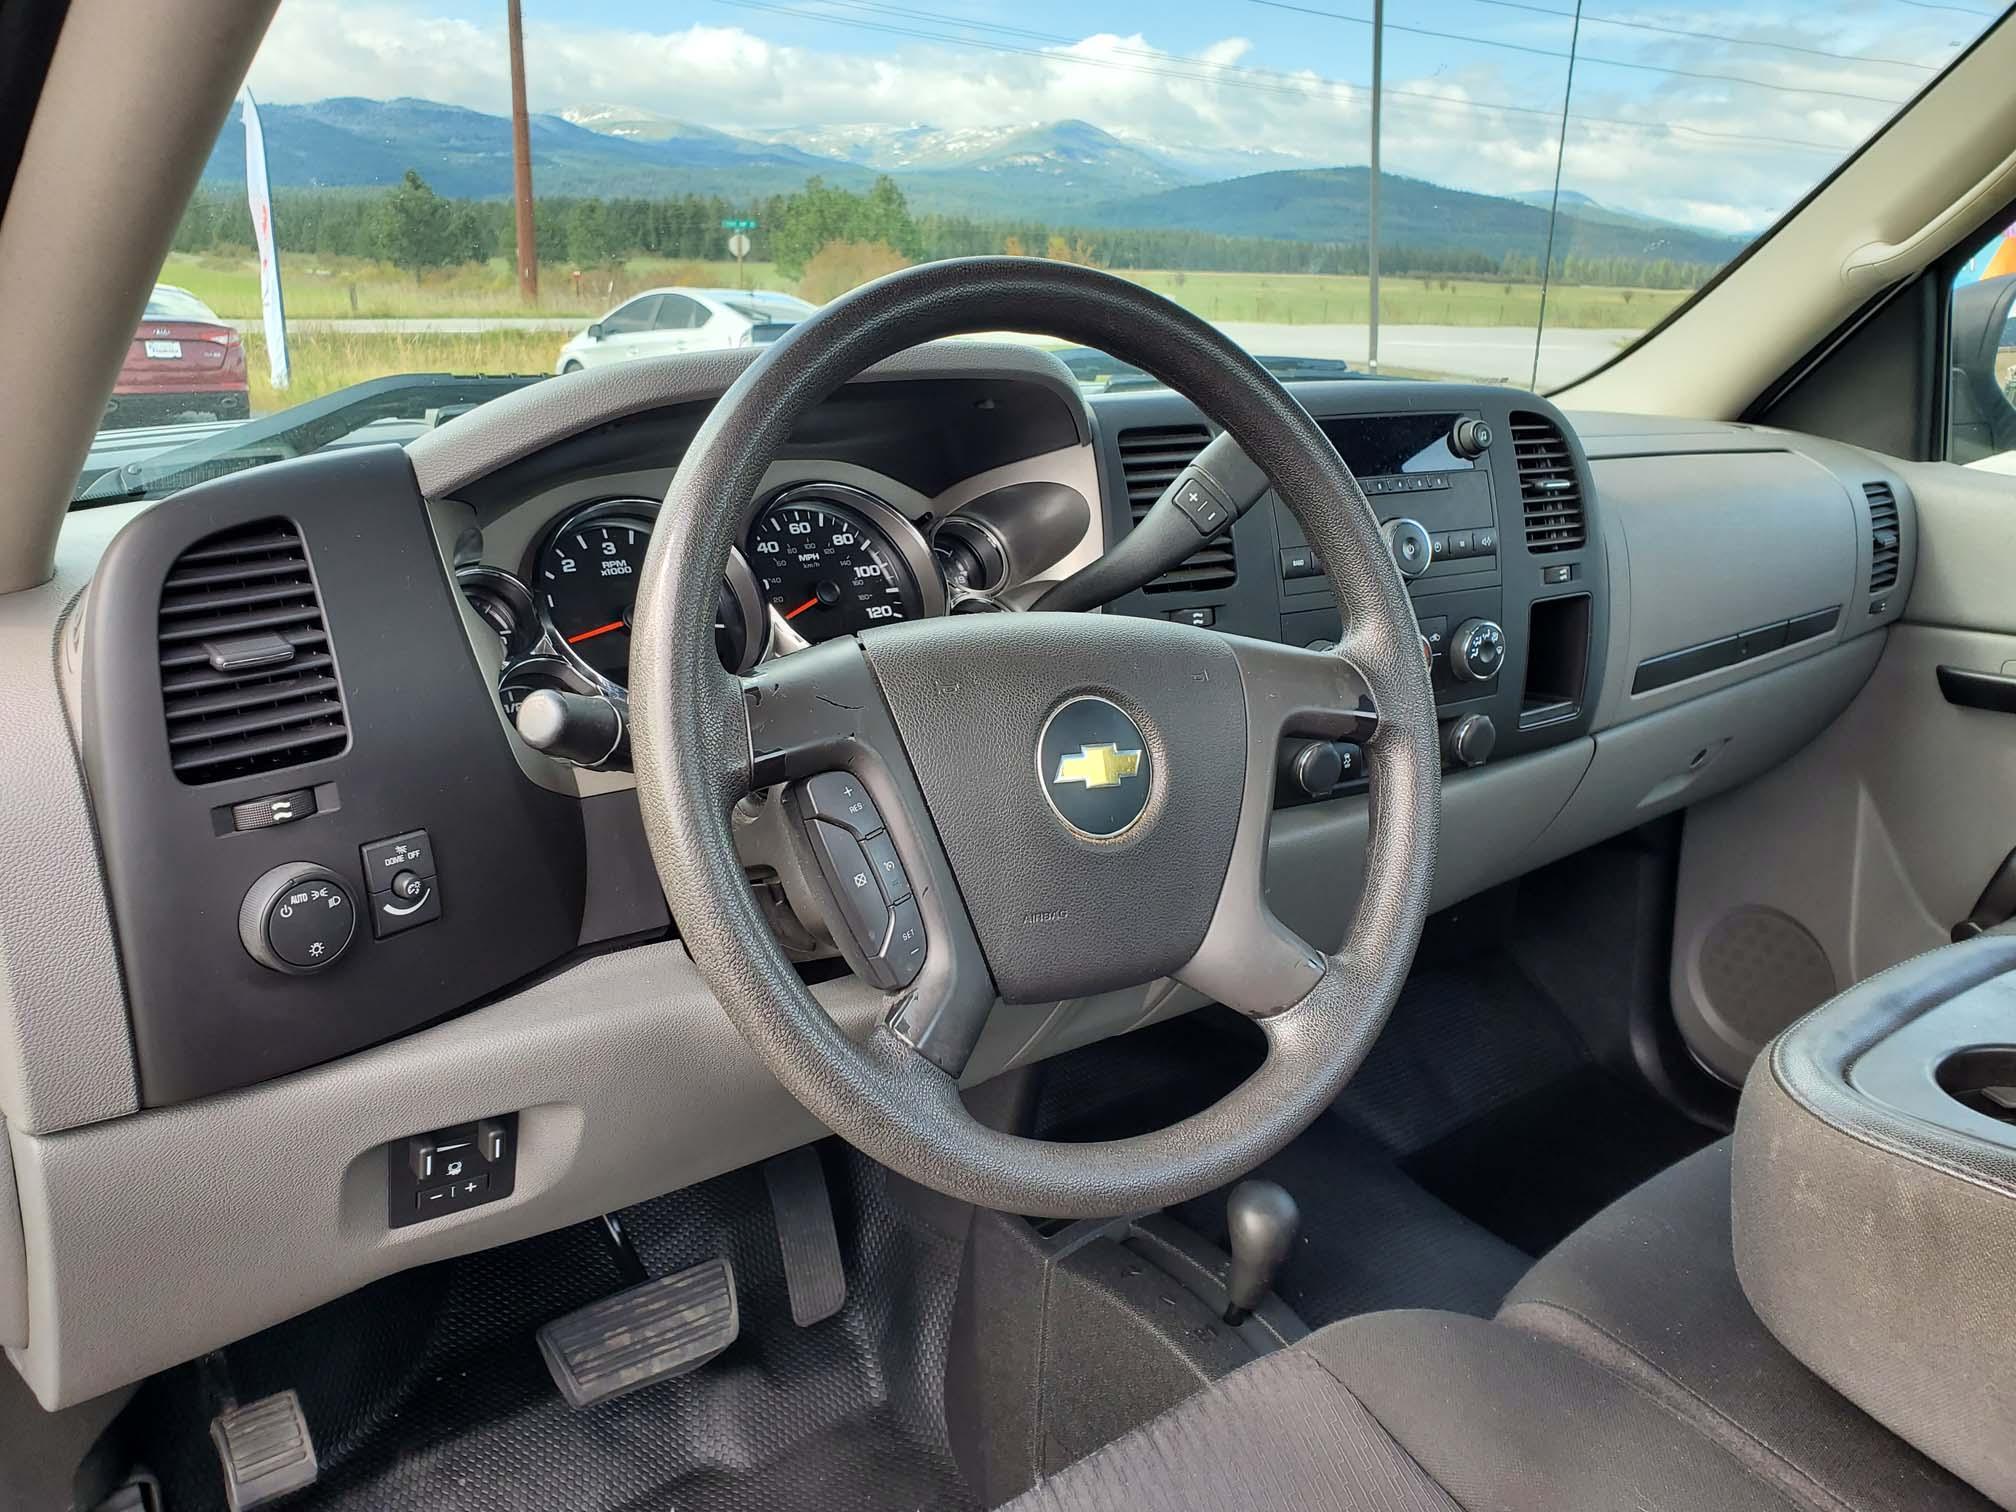 2013 Chevy 2500 Single Cab 2